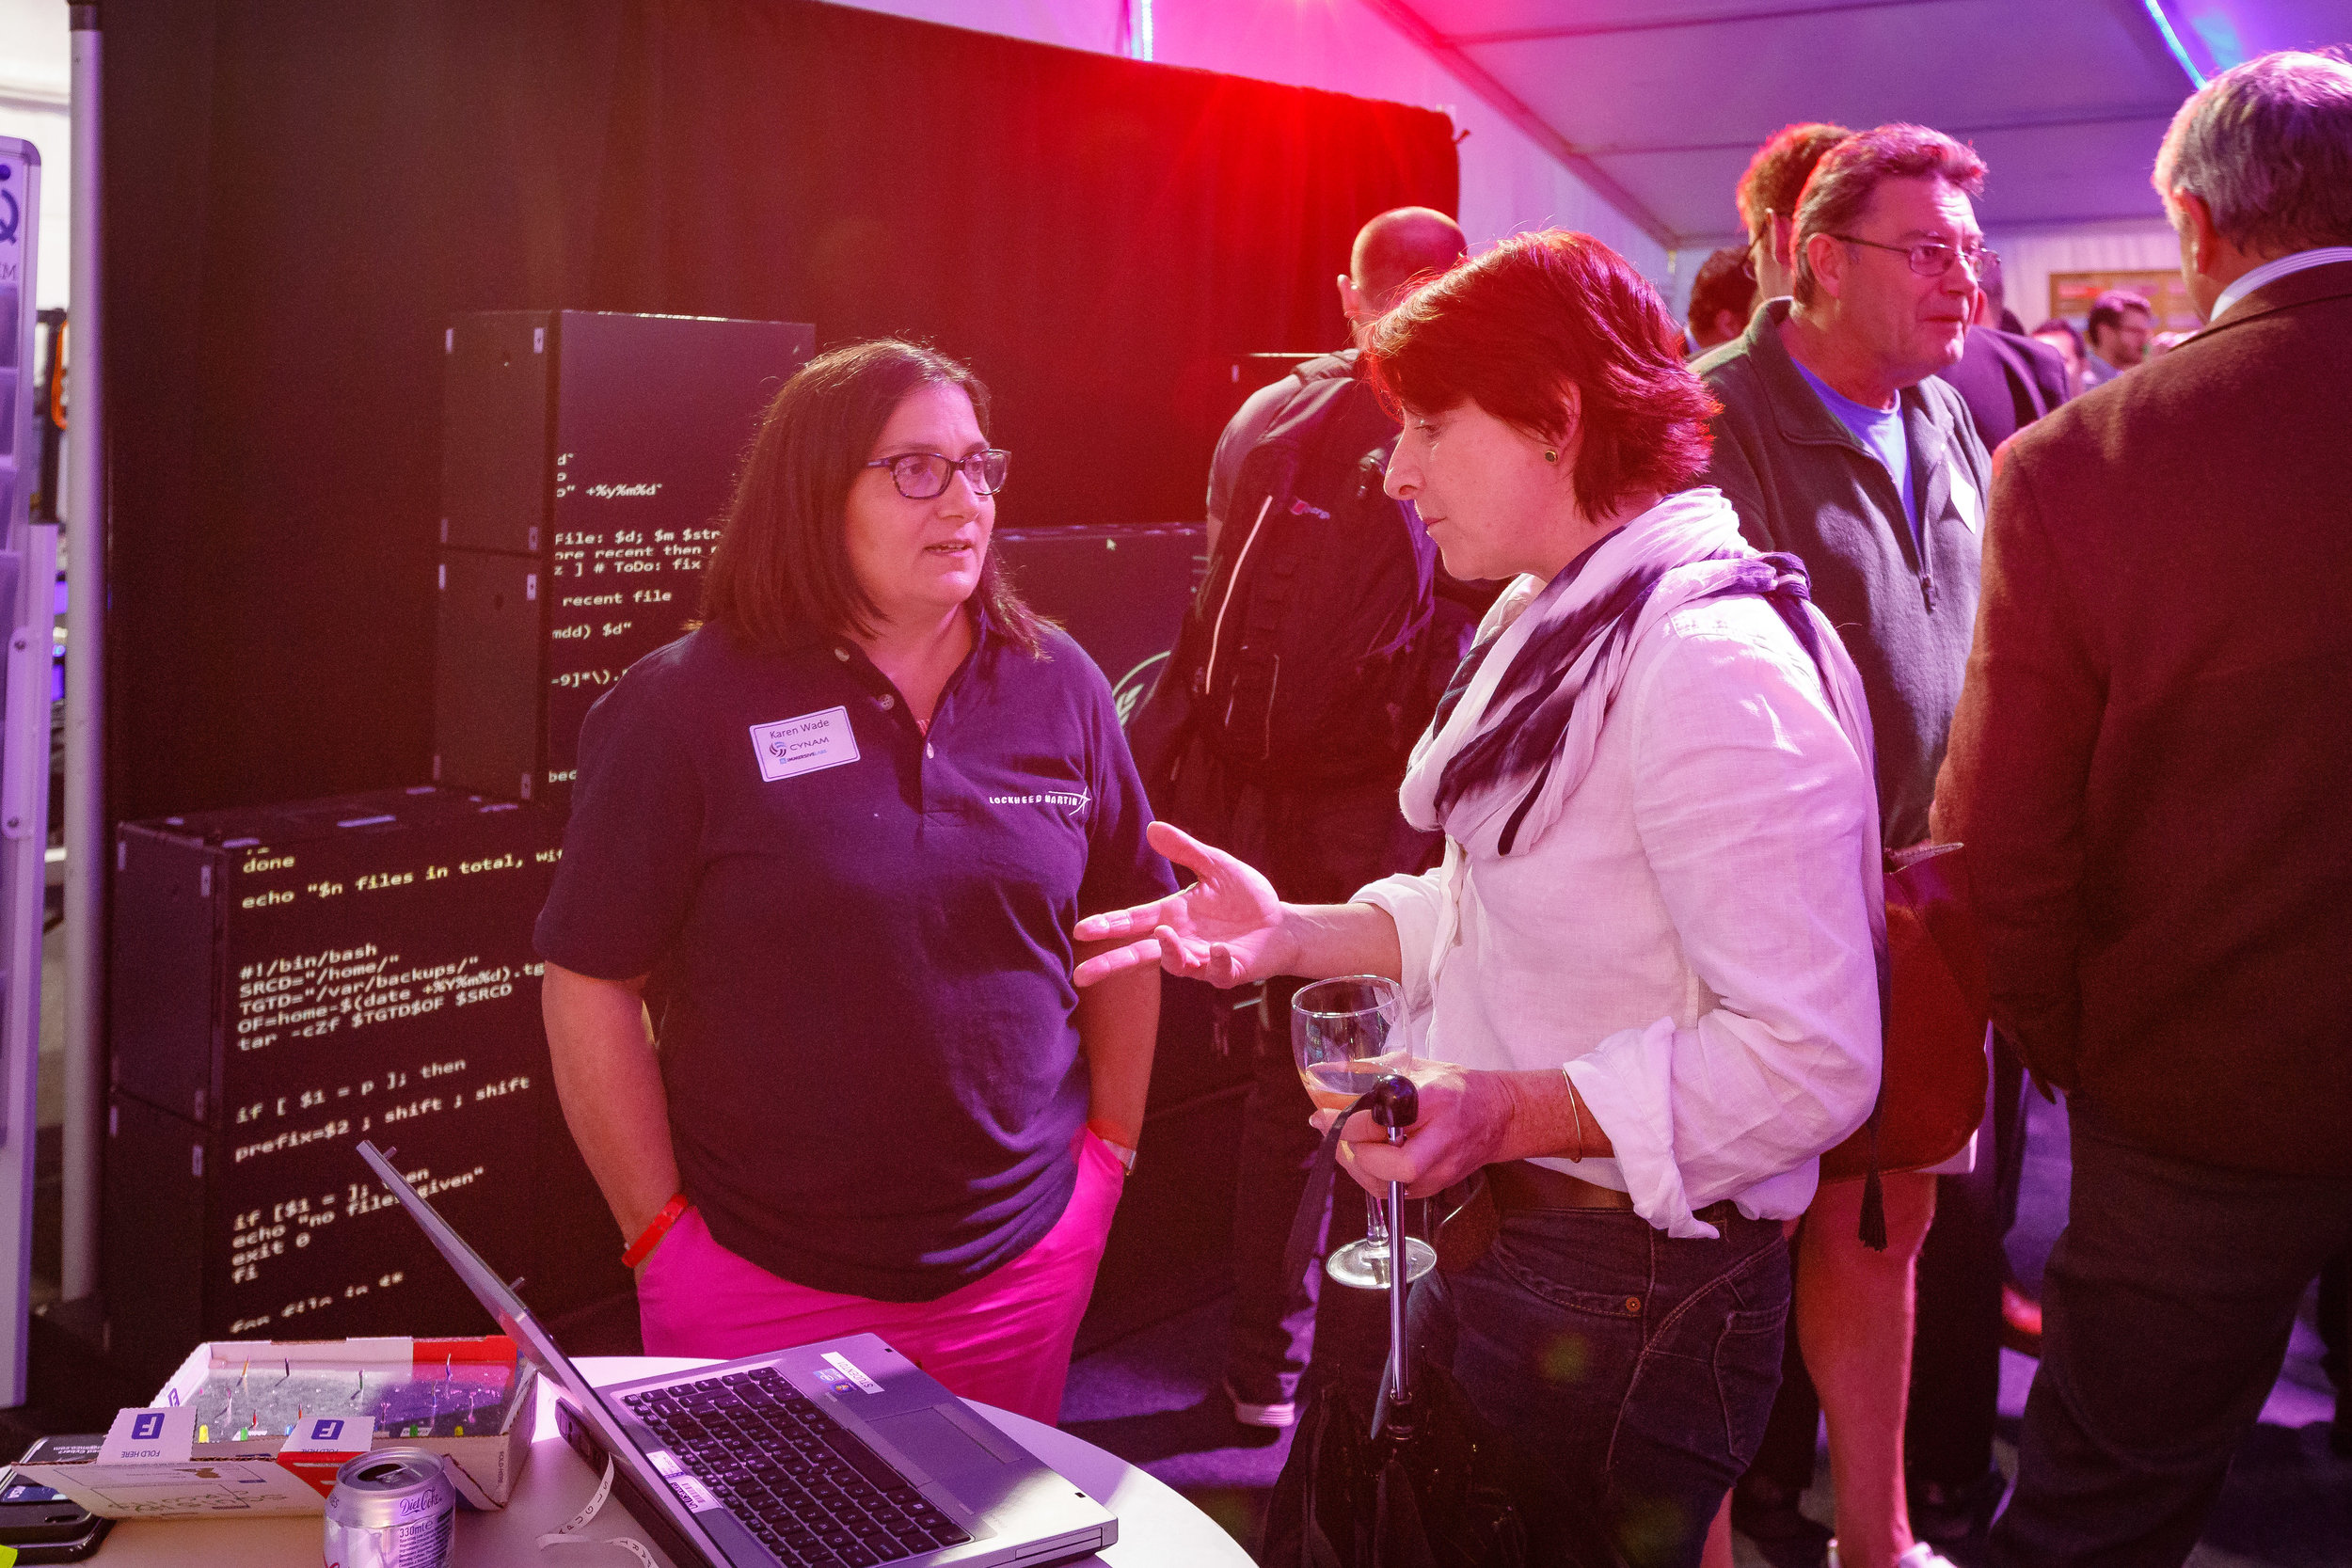 2018.06.08-CyNam-Cheltenham-Science-Festival-iPlus-0017.jpg